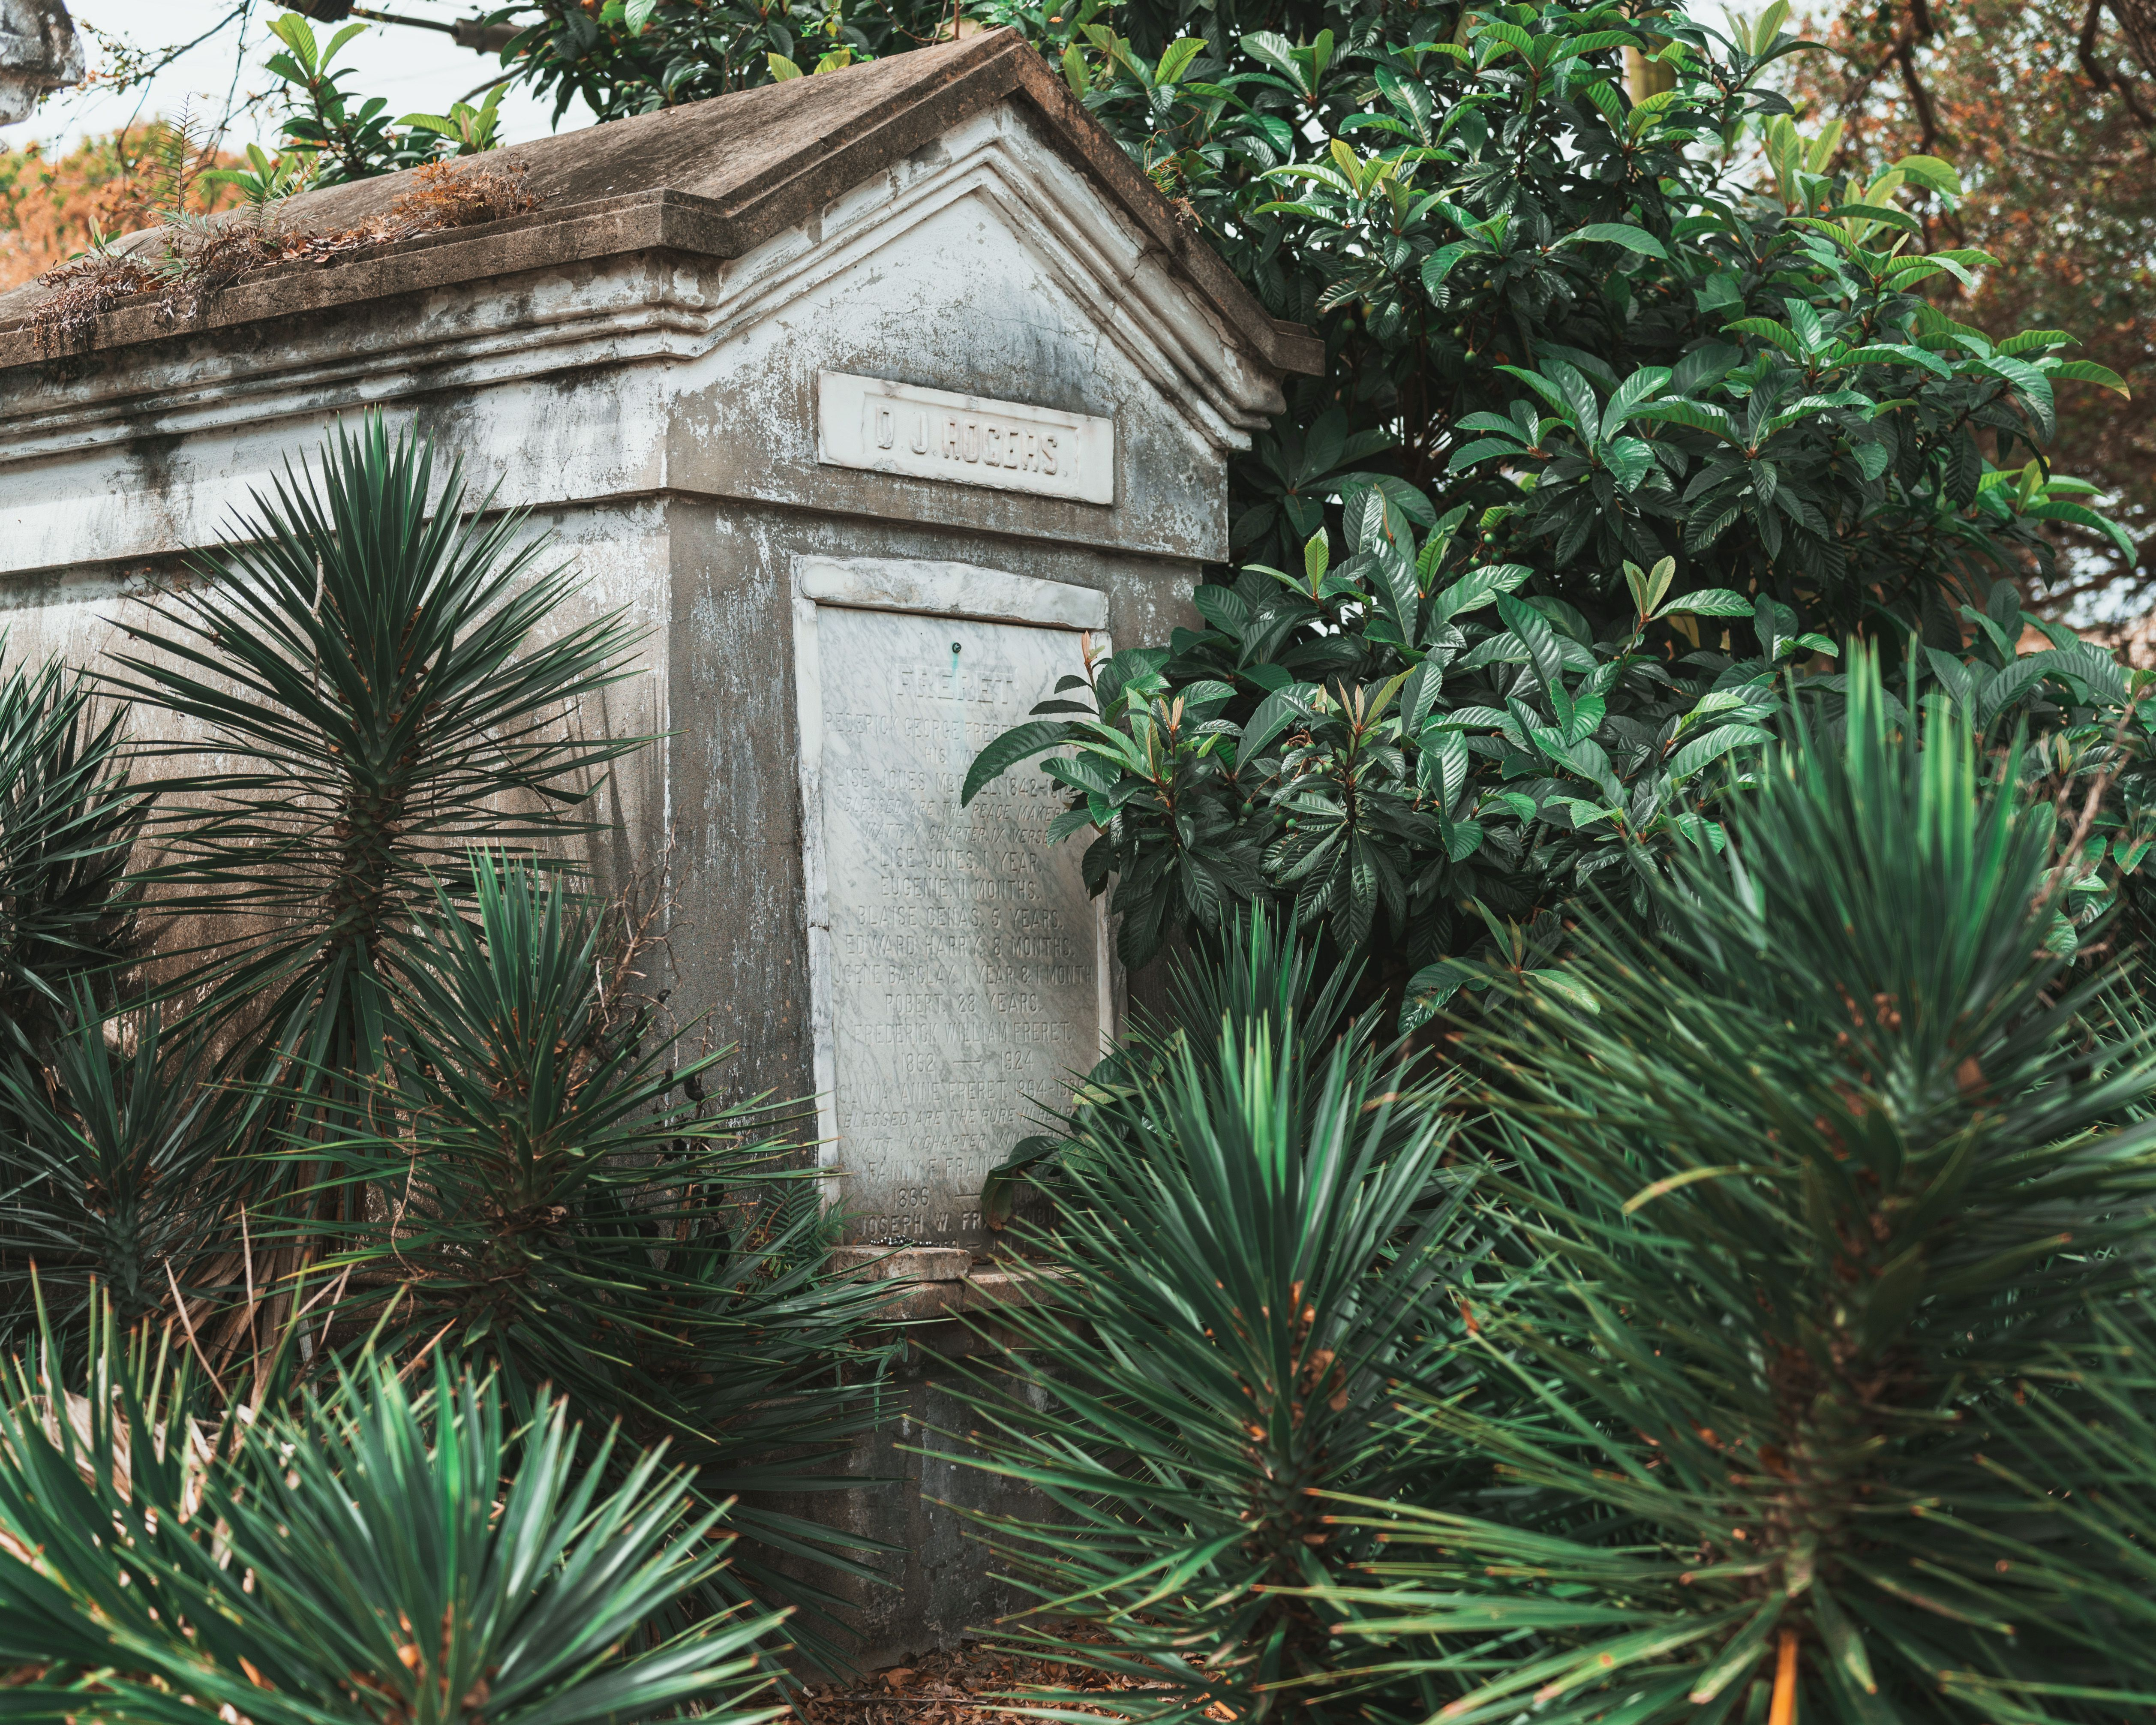 Cemetery in New Orelans